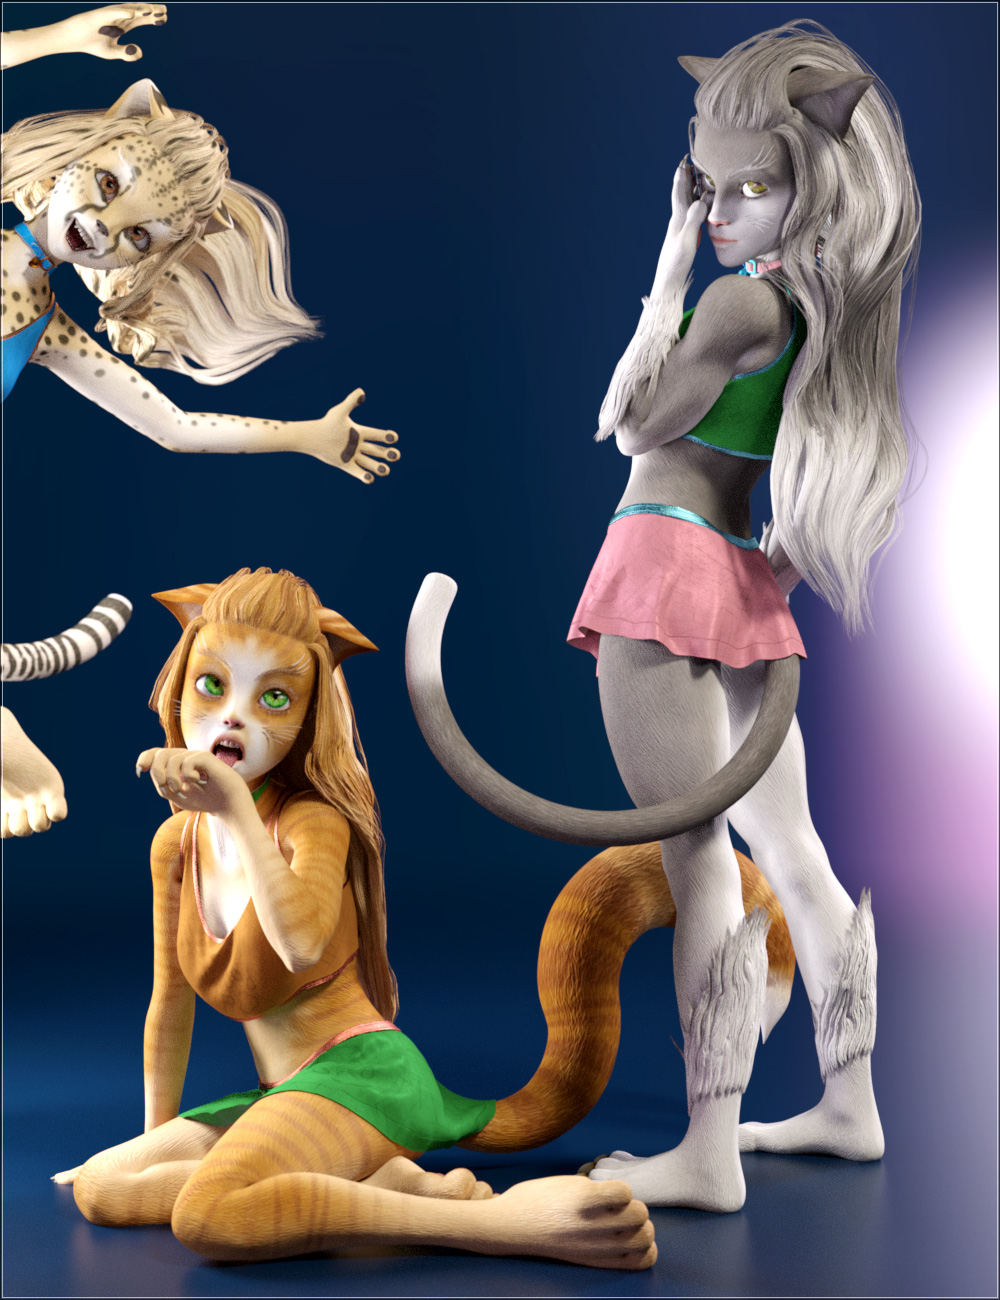 Catgirl Megapack for Genesis 8 Female(s) by: MABWillDupre, 3D Models by Daz 3D